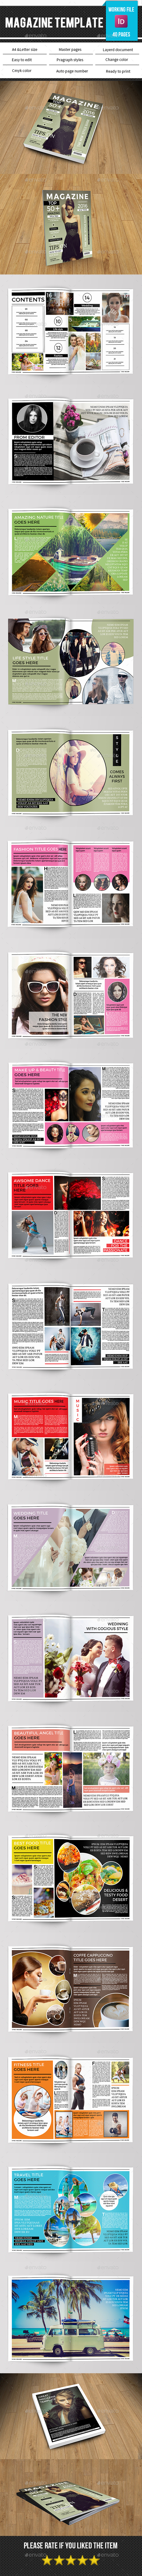 Multipurpose Magazine Template-V15 - Magazines Print Templates